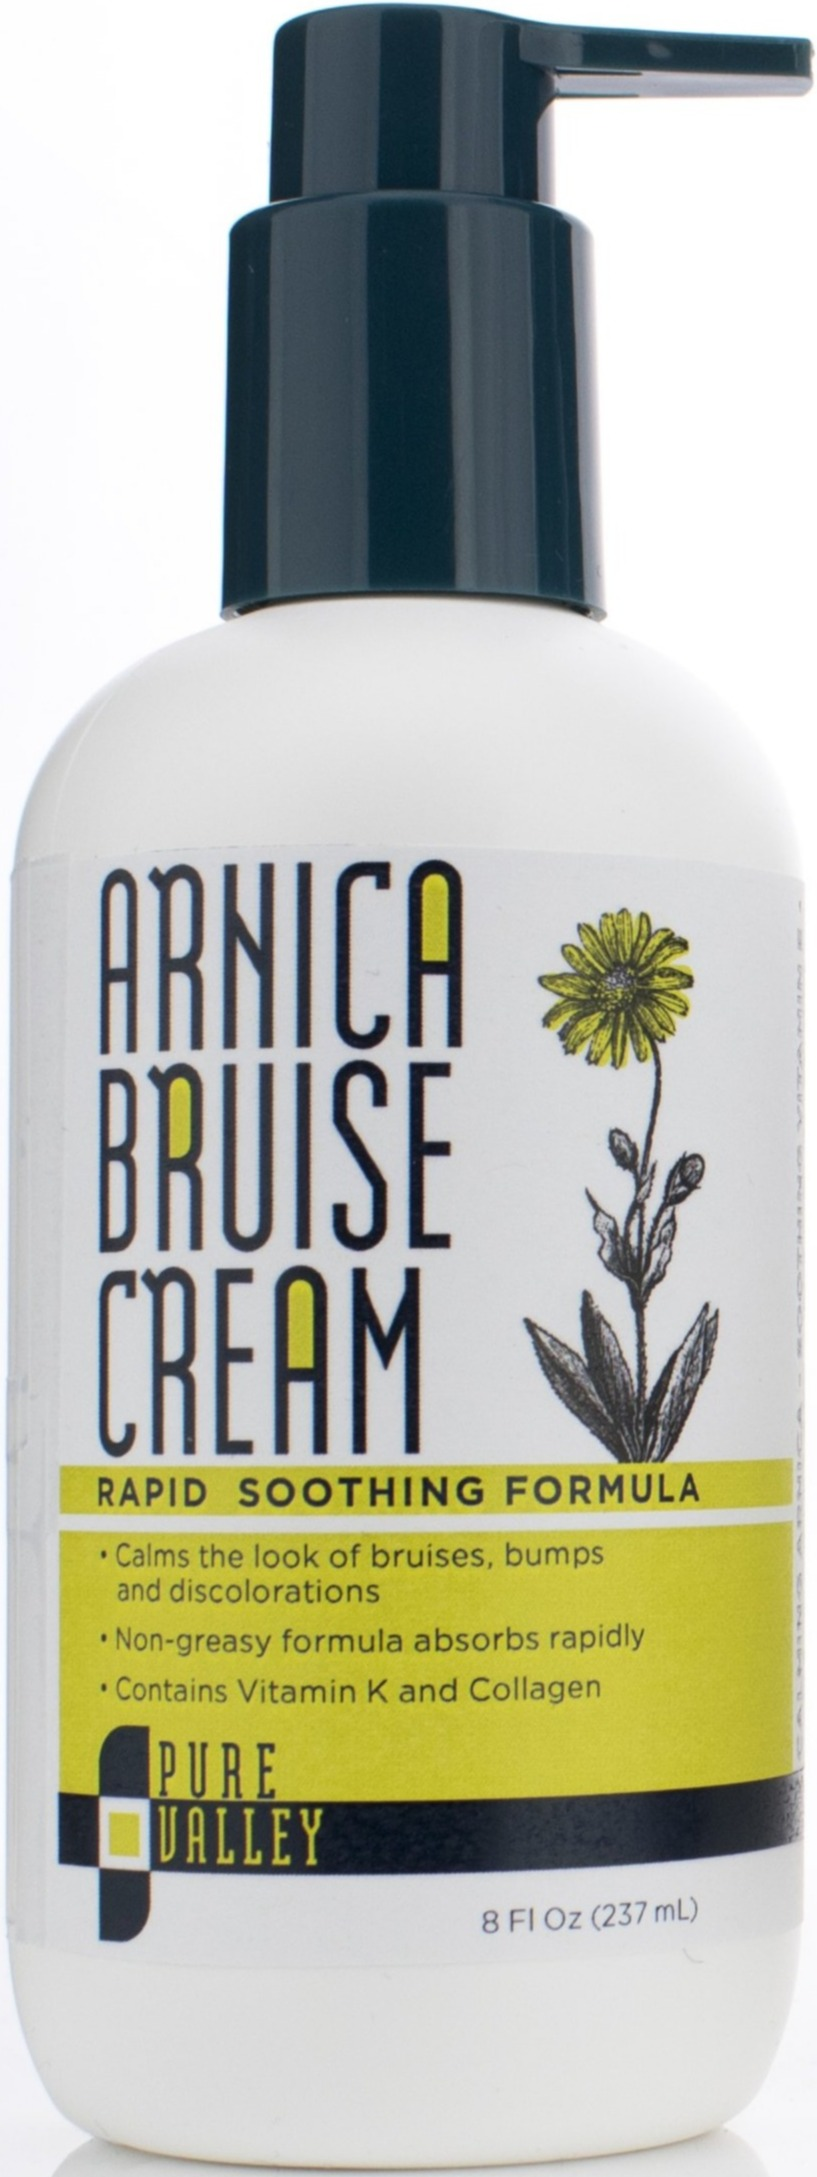 Pure valley Arnica Bruise Cream